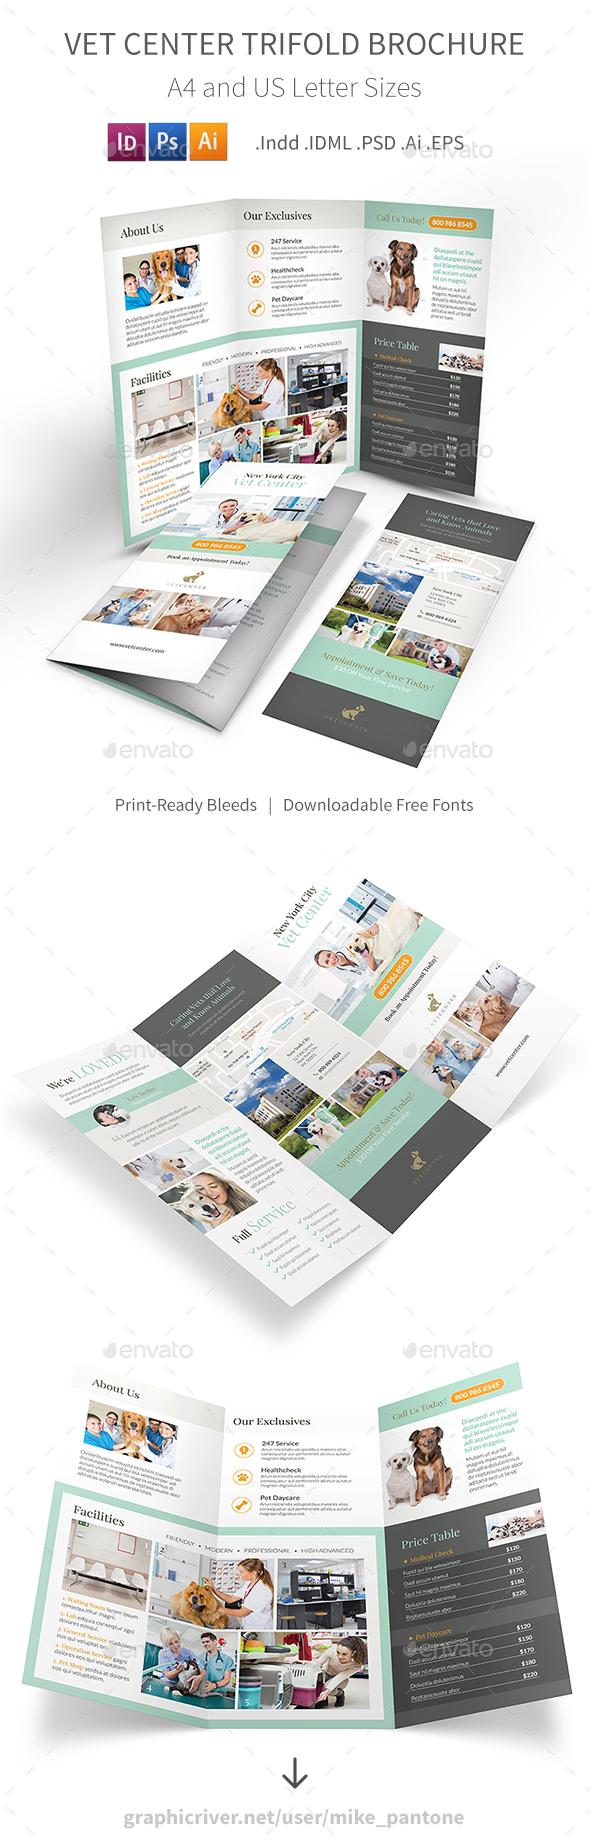 Vet Center Trifold Brochure - Informational Brochures